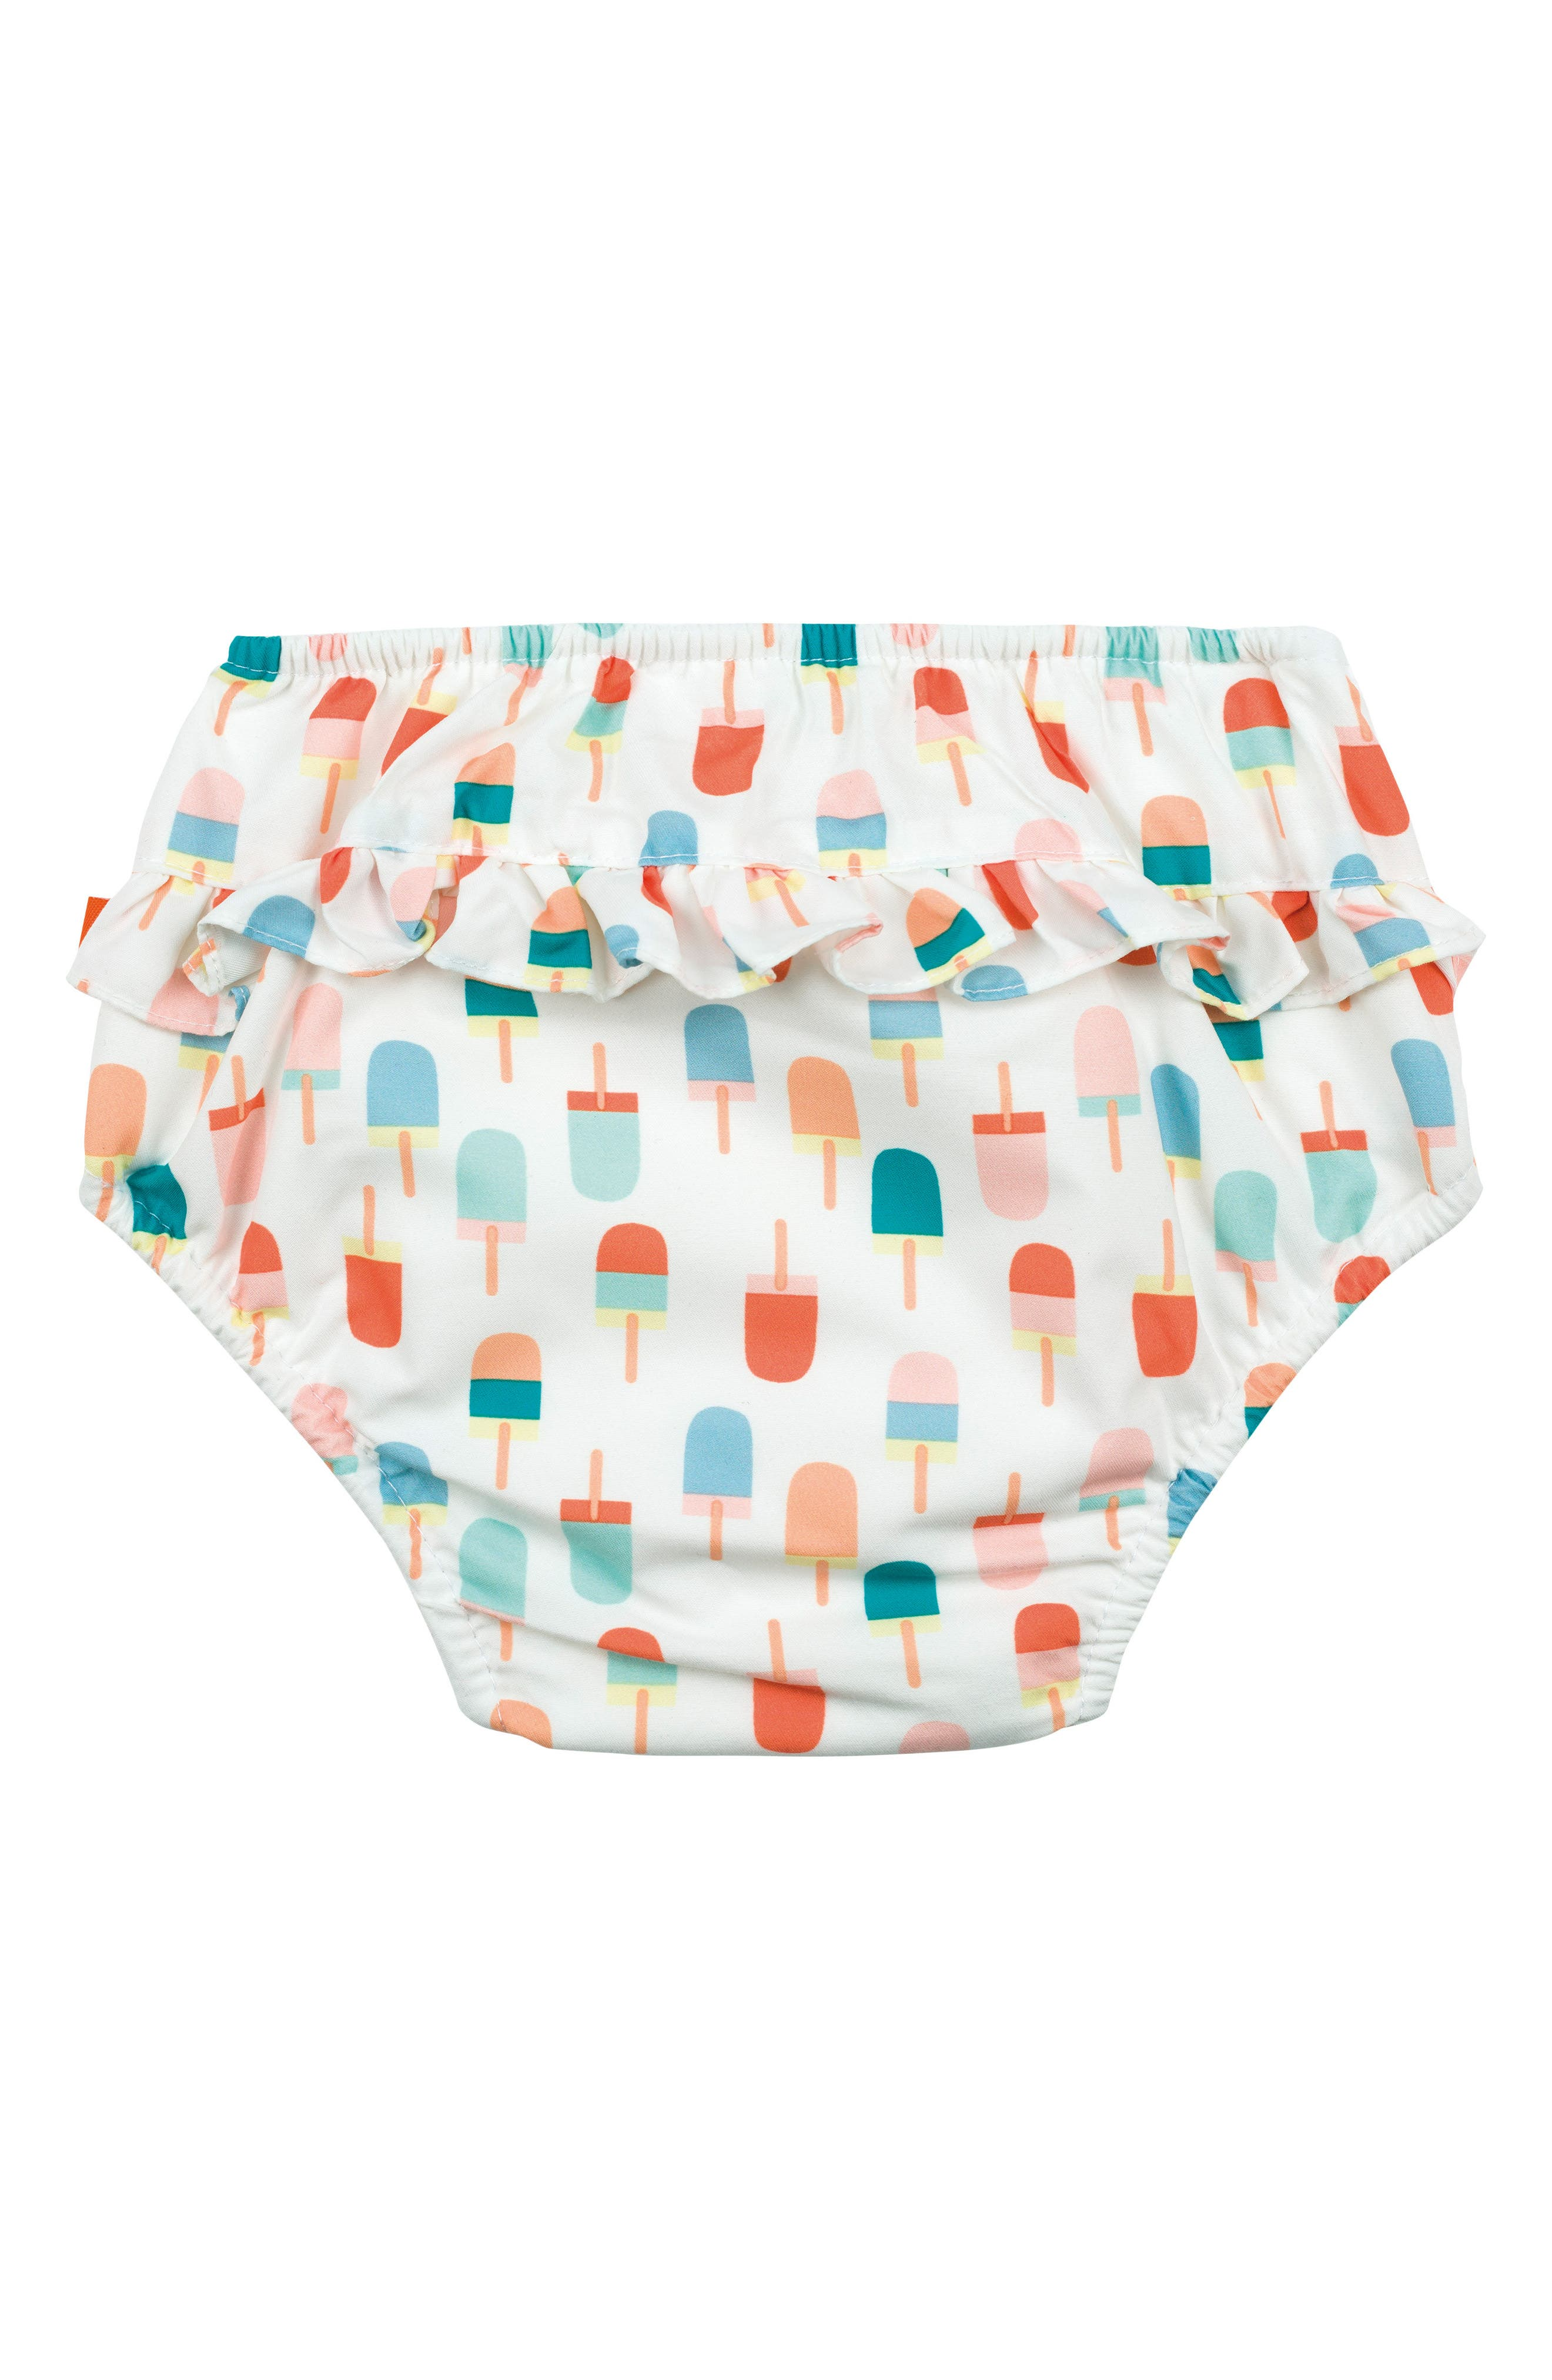 Ice Cream Cone Swim Diaper Cover,                             Alternate thumbnail 3, color,                             White Orange Teal